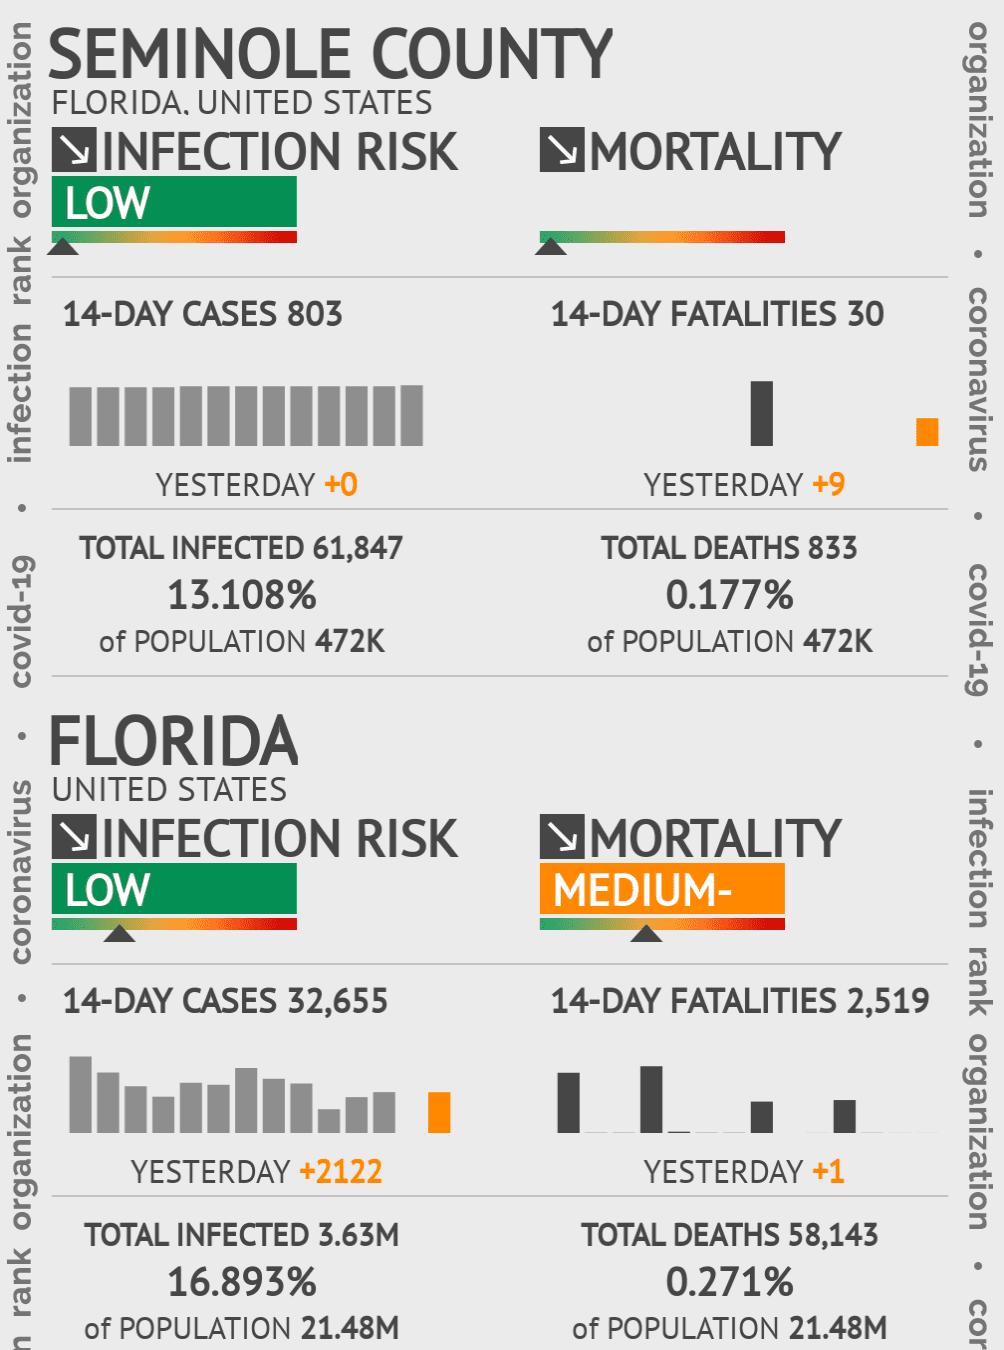 Seminole County Coronavirus Covid-19 Risk of Infection on November 26, 2020